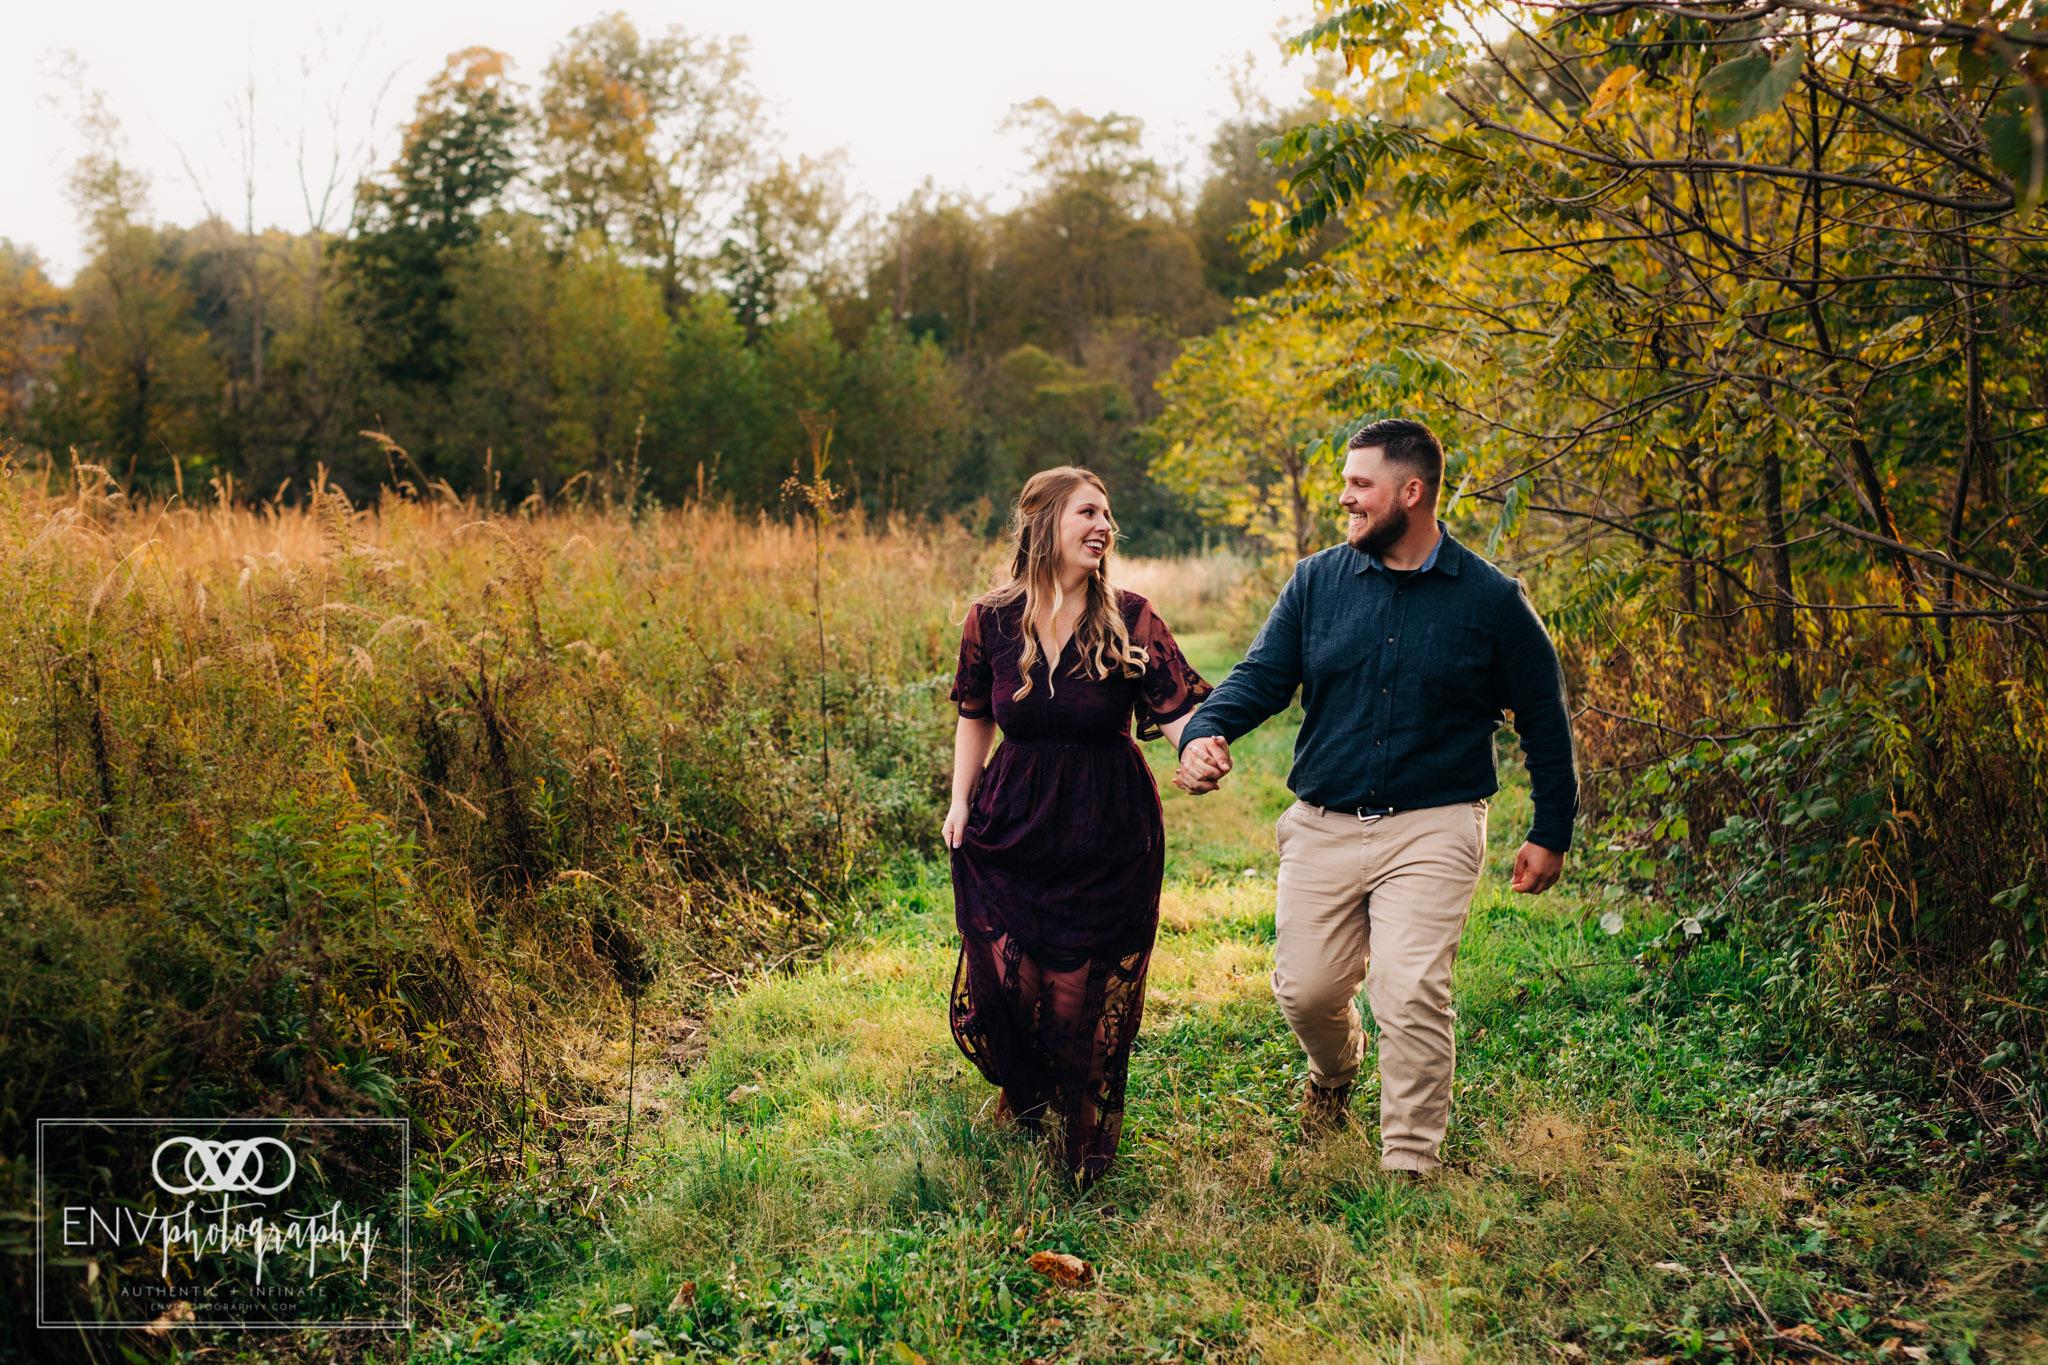 columbus ohio mount vernon ohio engagement photographer 2018 (3).jpg